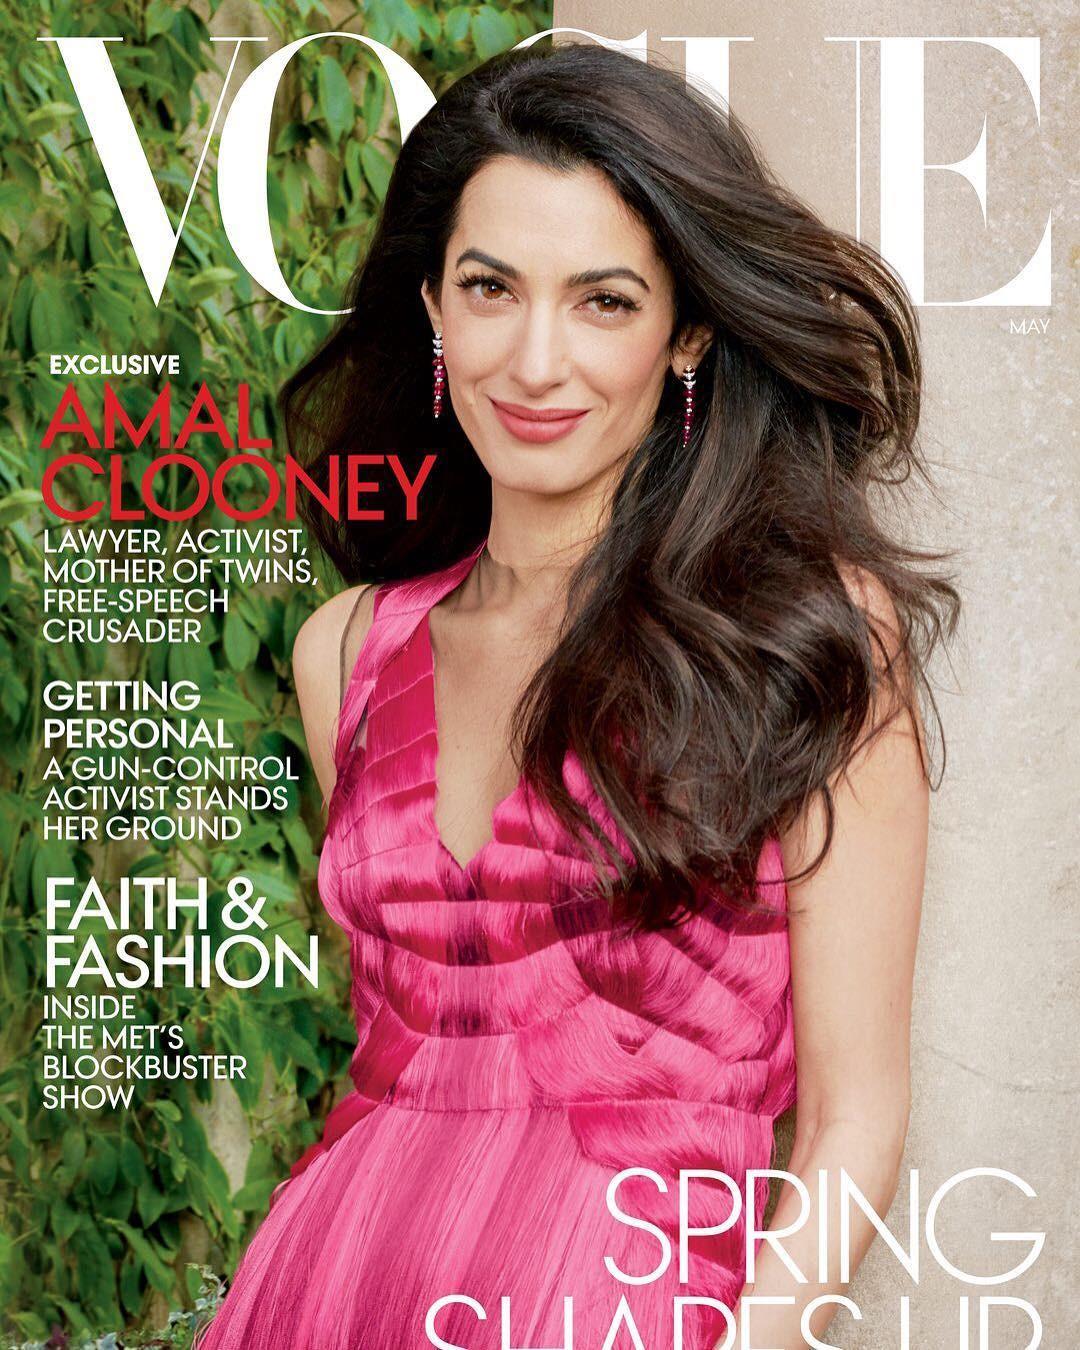 Amal Clooney estampa a capa da Vogue America de maio (Foto: ANNIE LEIBOVITZ)